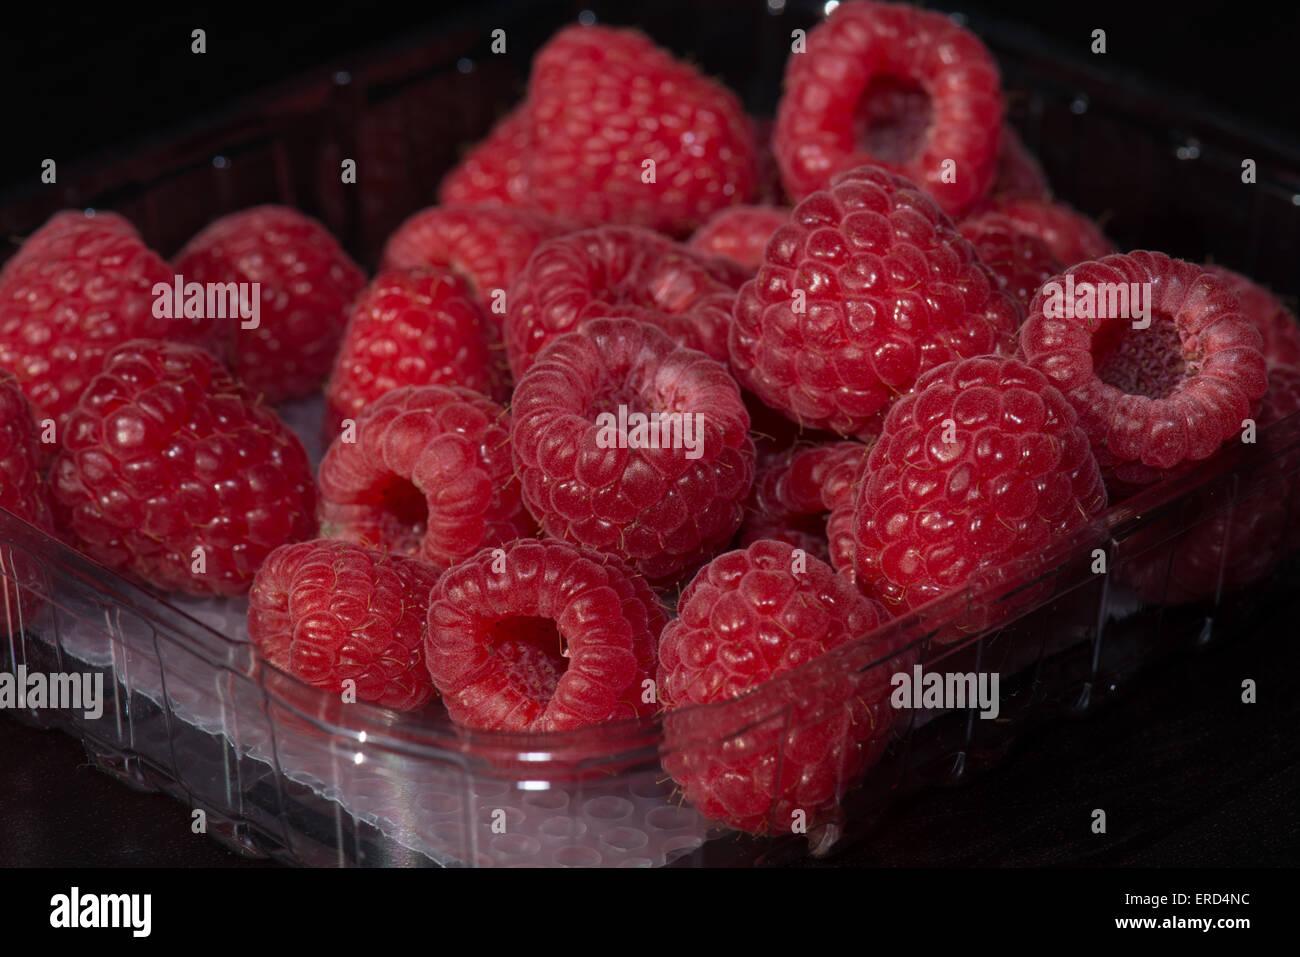 Raspberries, raspberry - Stock Image